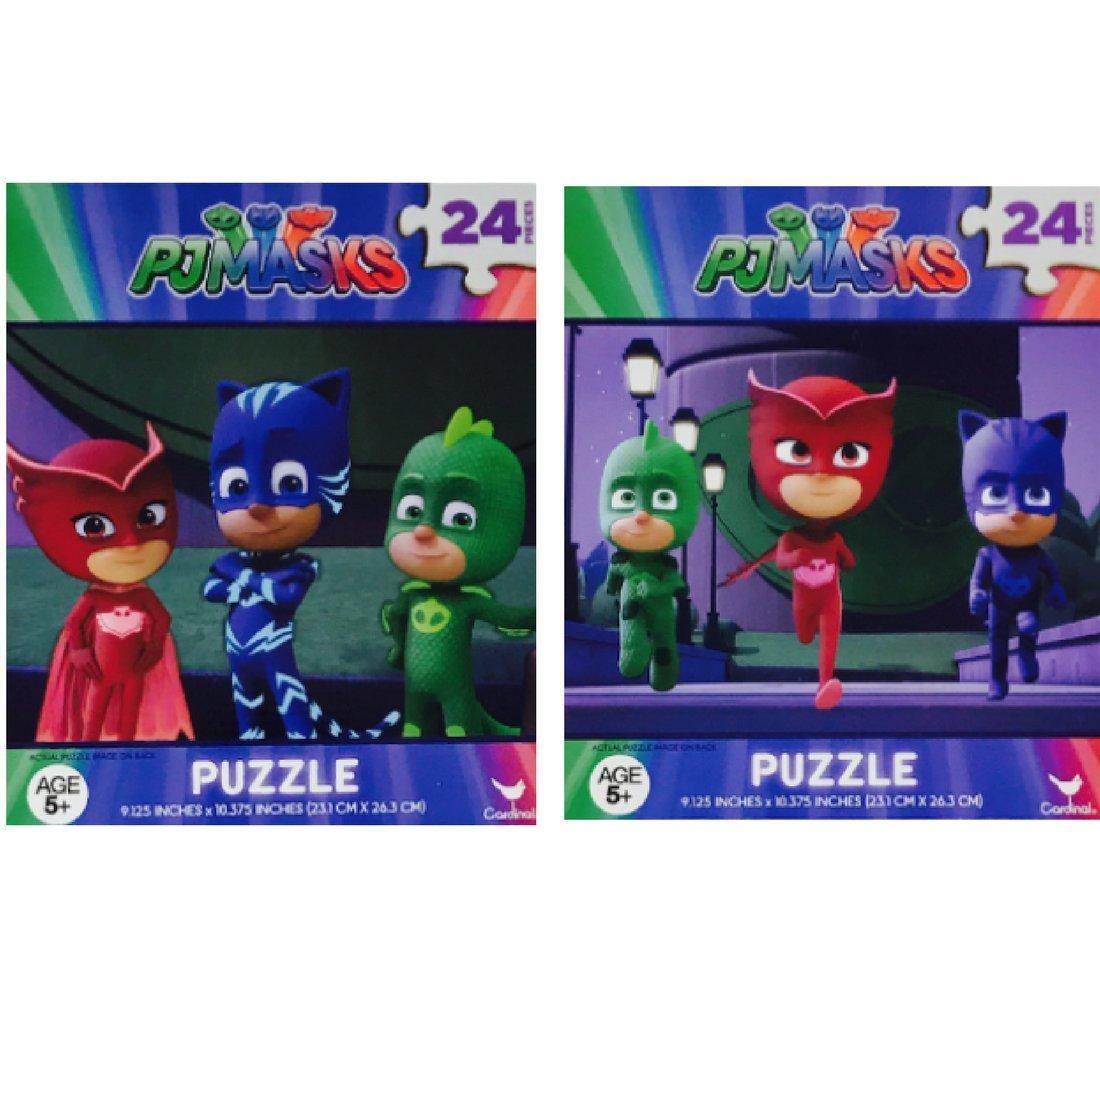 PJ Masks Jigsaw Puzzle 2 Pack Assorted Designs 24 Piece Assorted Design